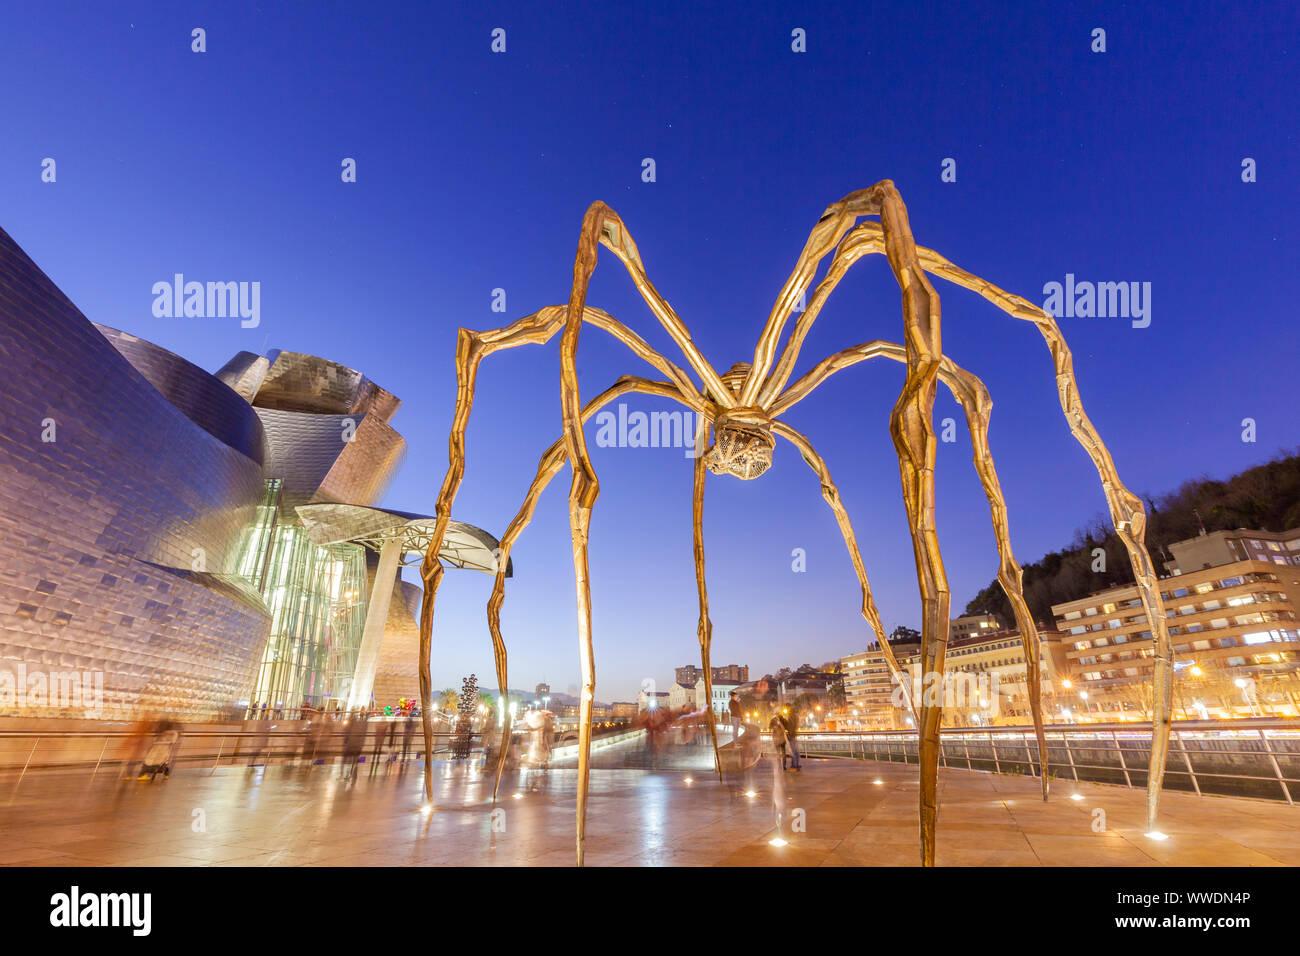 Maman sculpture in Guggenheim Museum, Bilbao, Spain Stock Photo